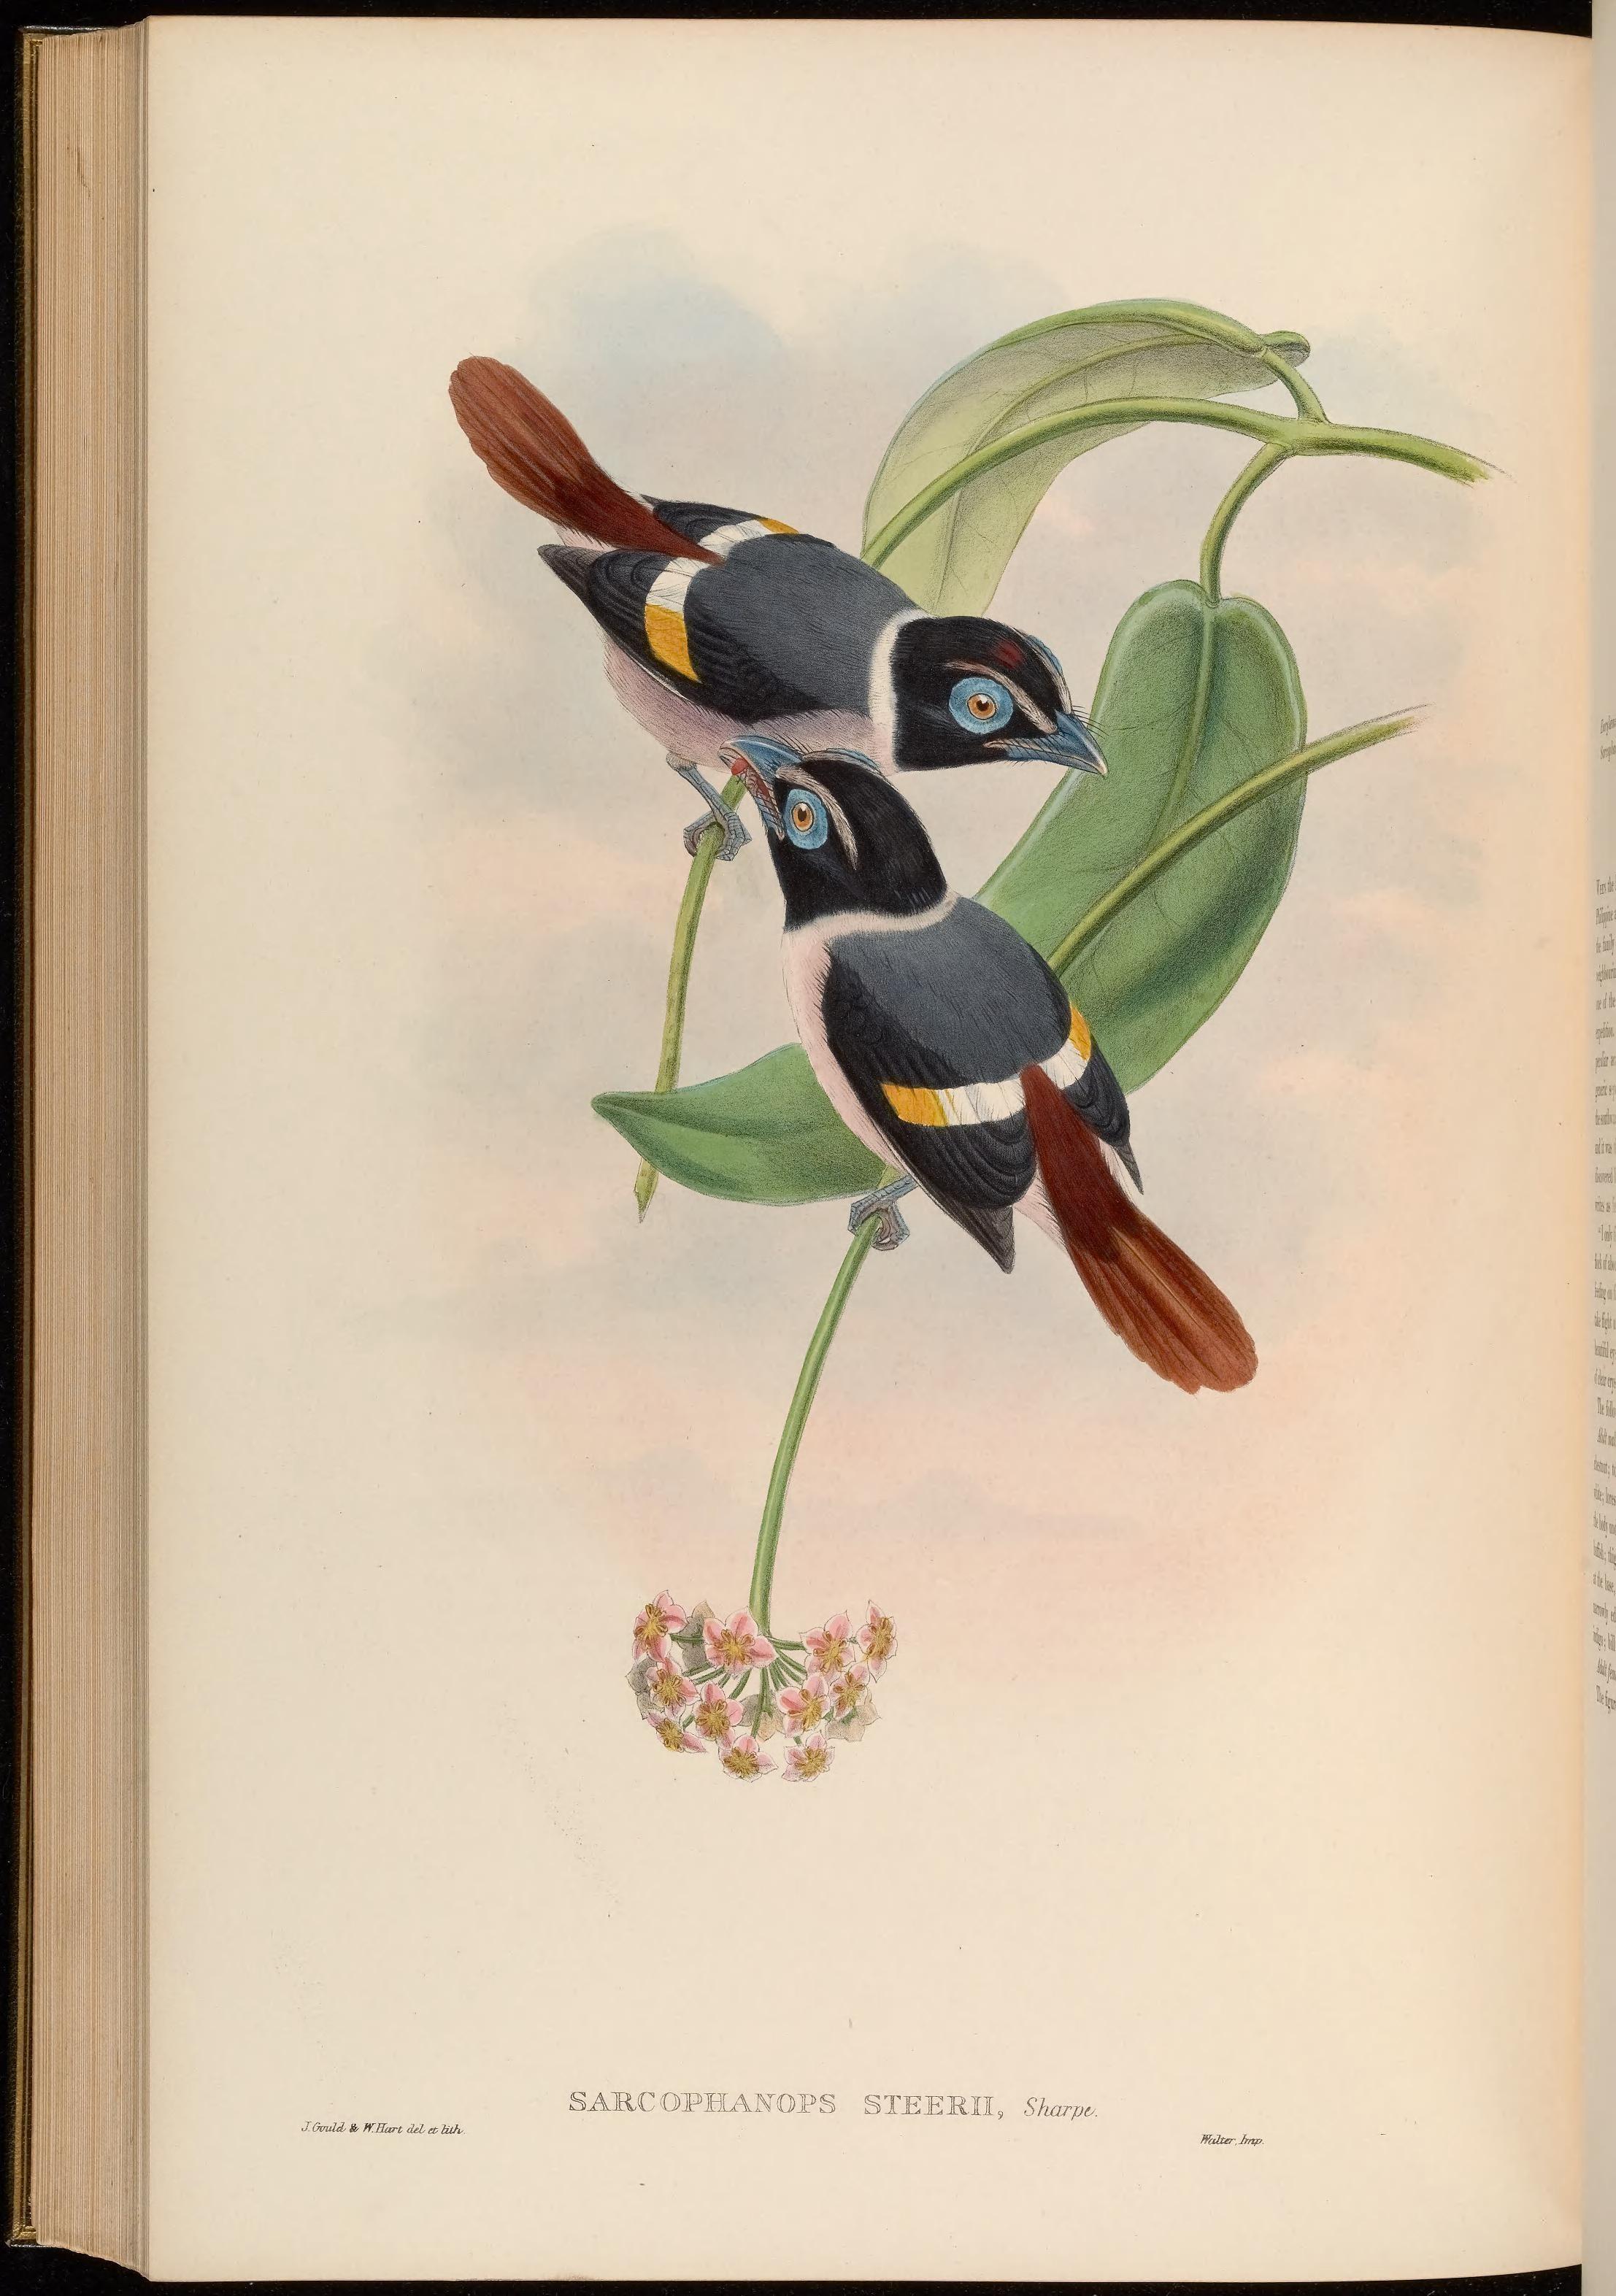 Image of Wattled Broadbill